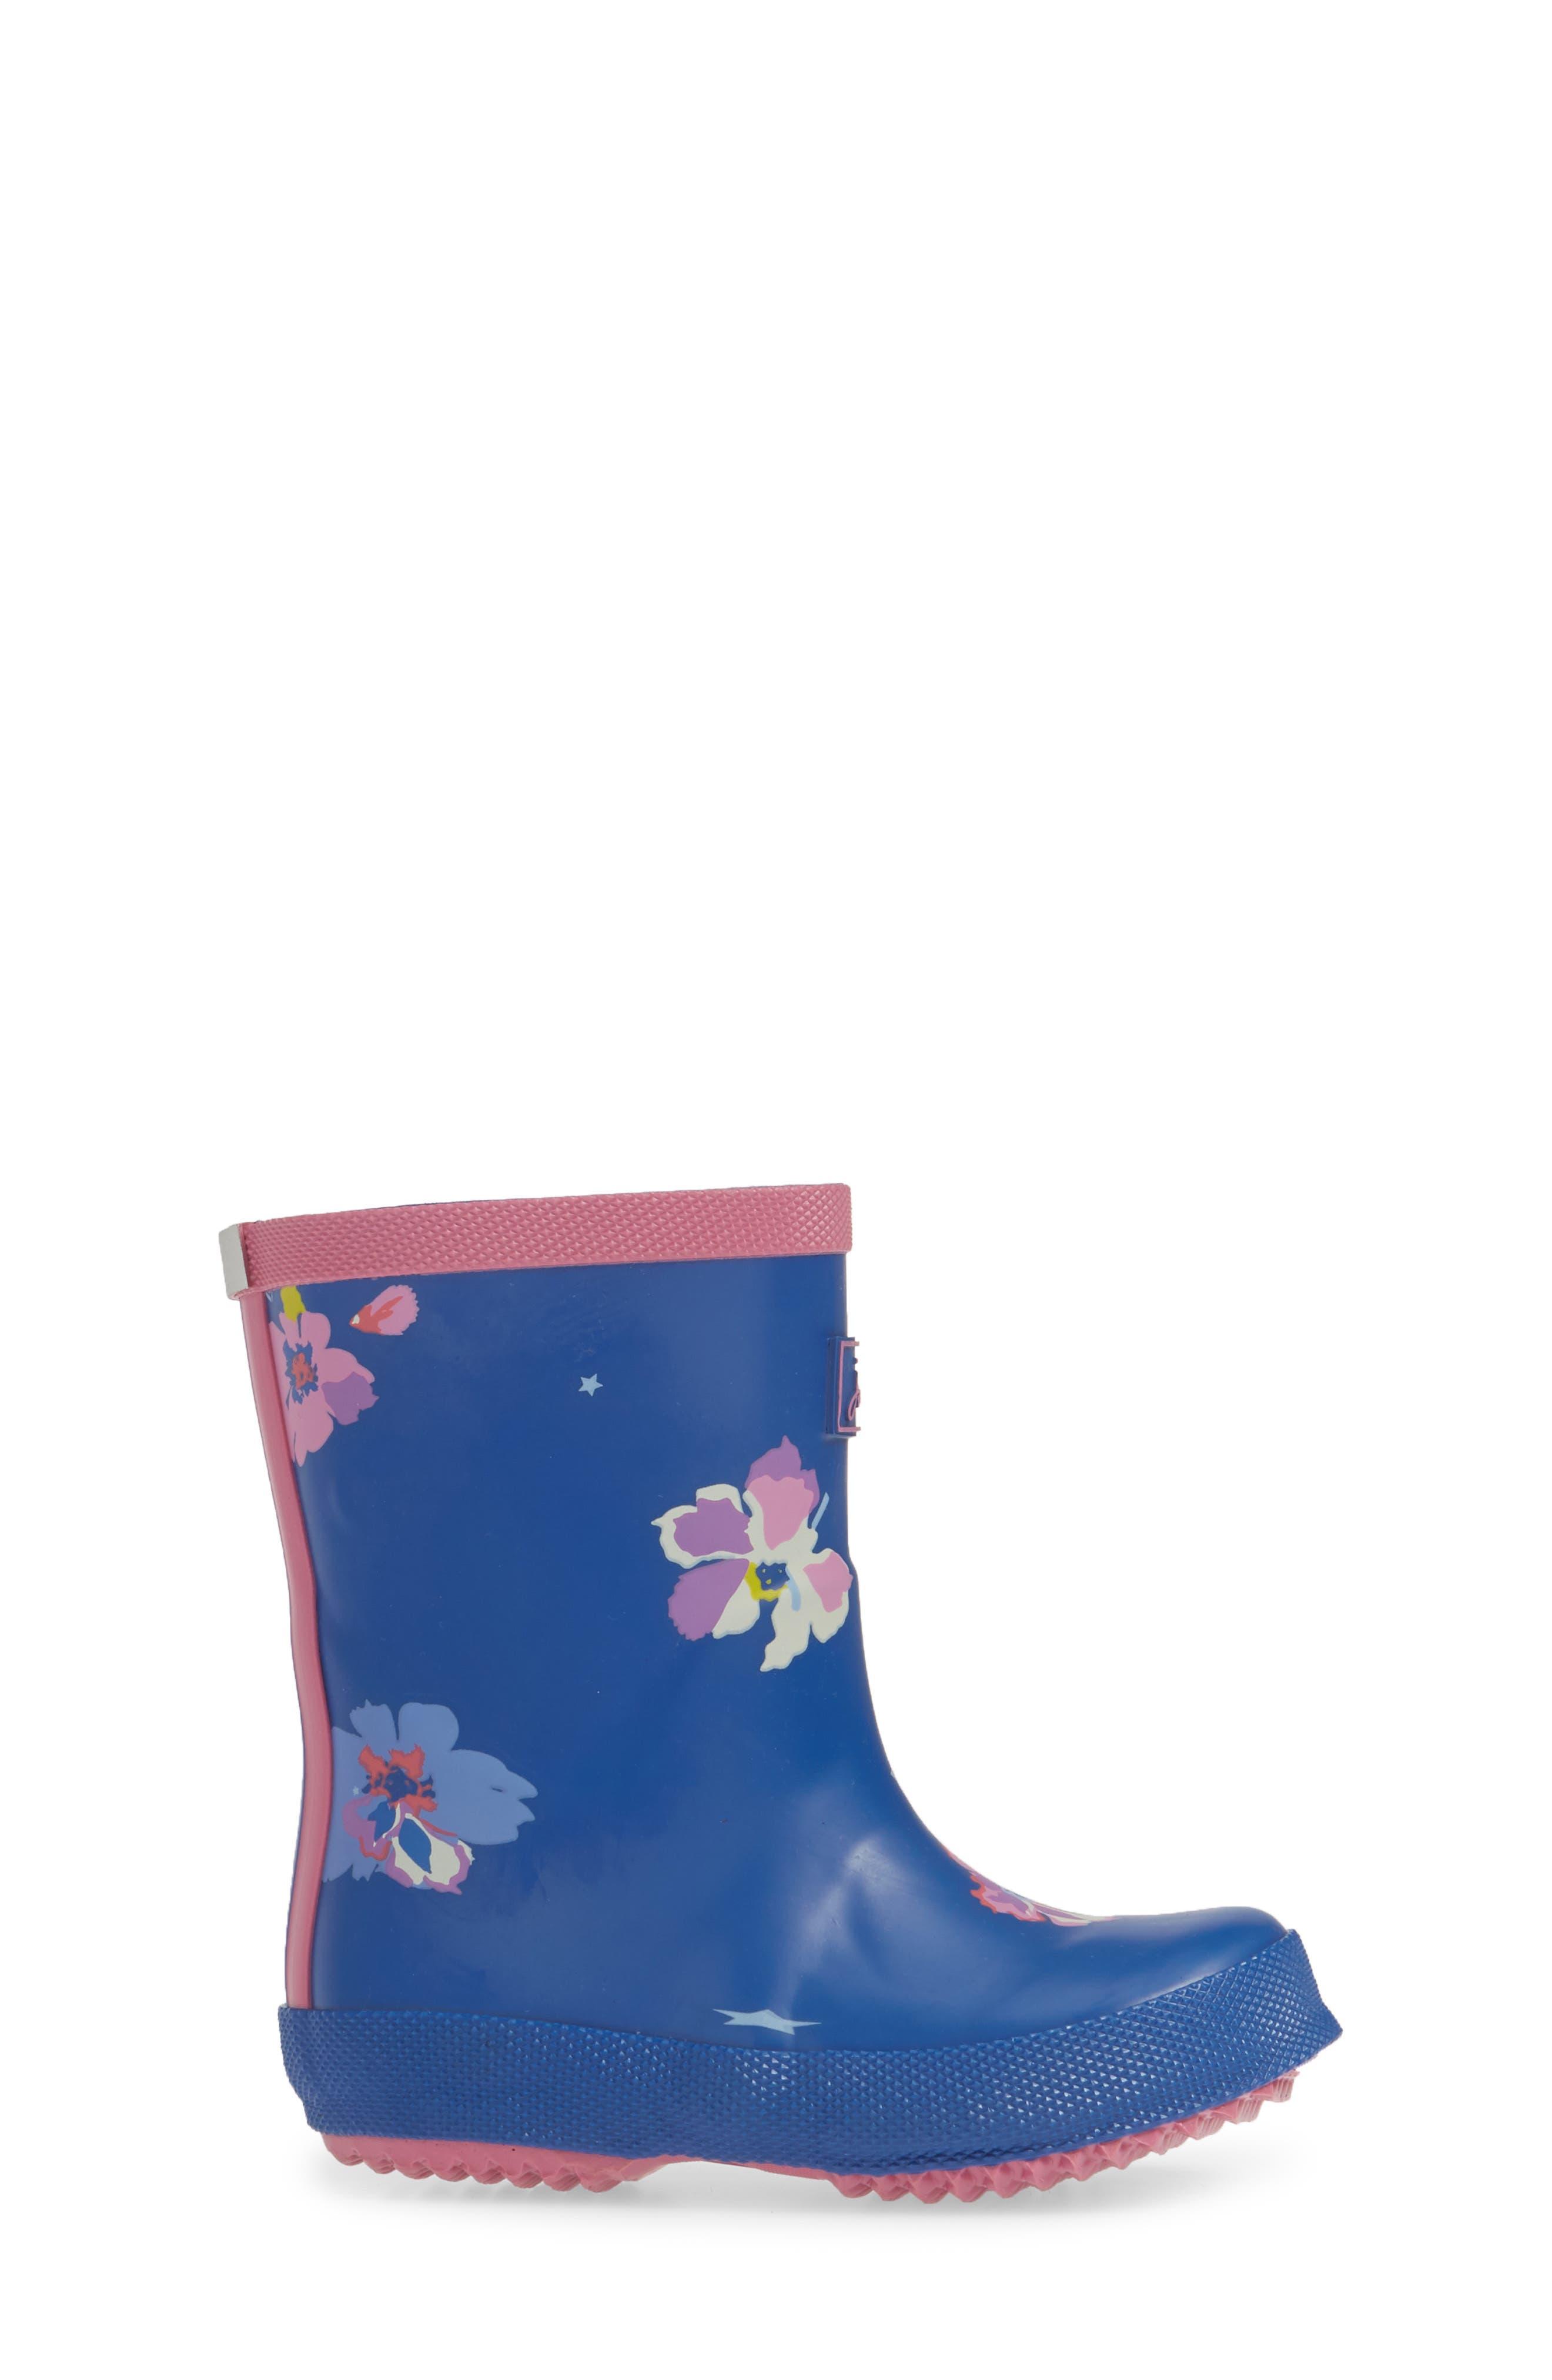 JOULES, Print Waterproof Rain Boot, Alternate thumbnail 3, color, BLUE CONFETTI FLORAL